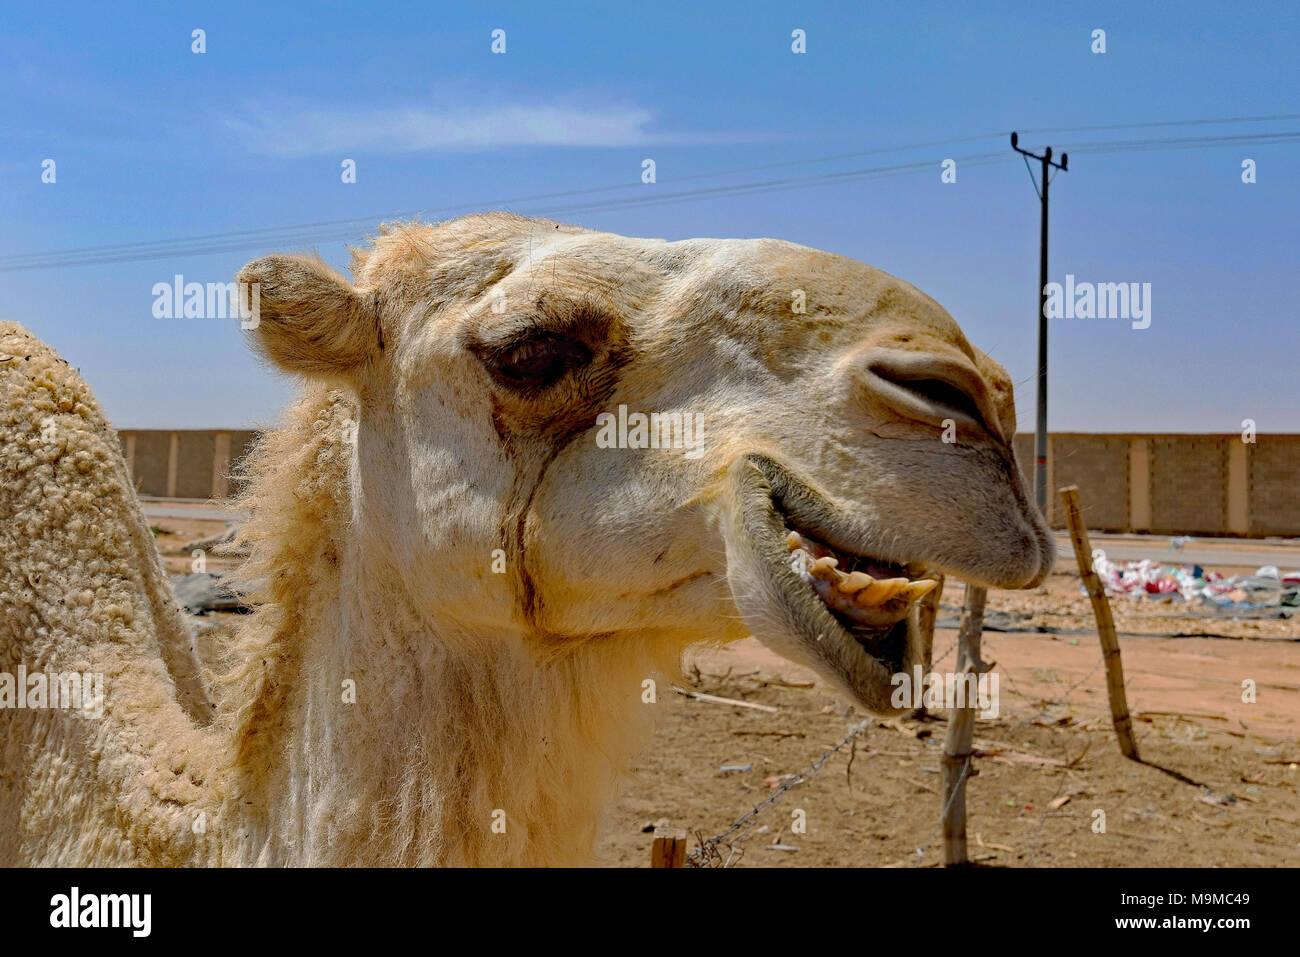 Close-ups of camels for sale near Riyadh, Saudi Arabia Stock